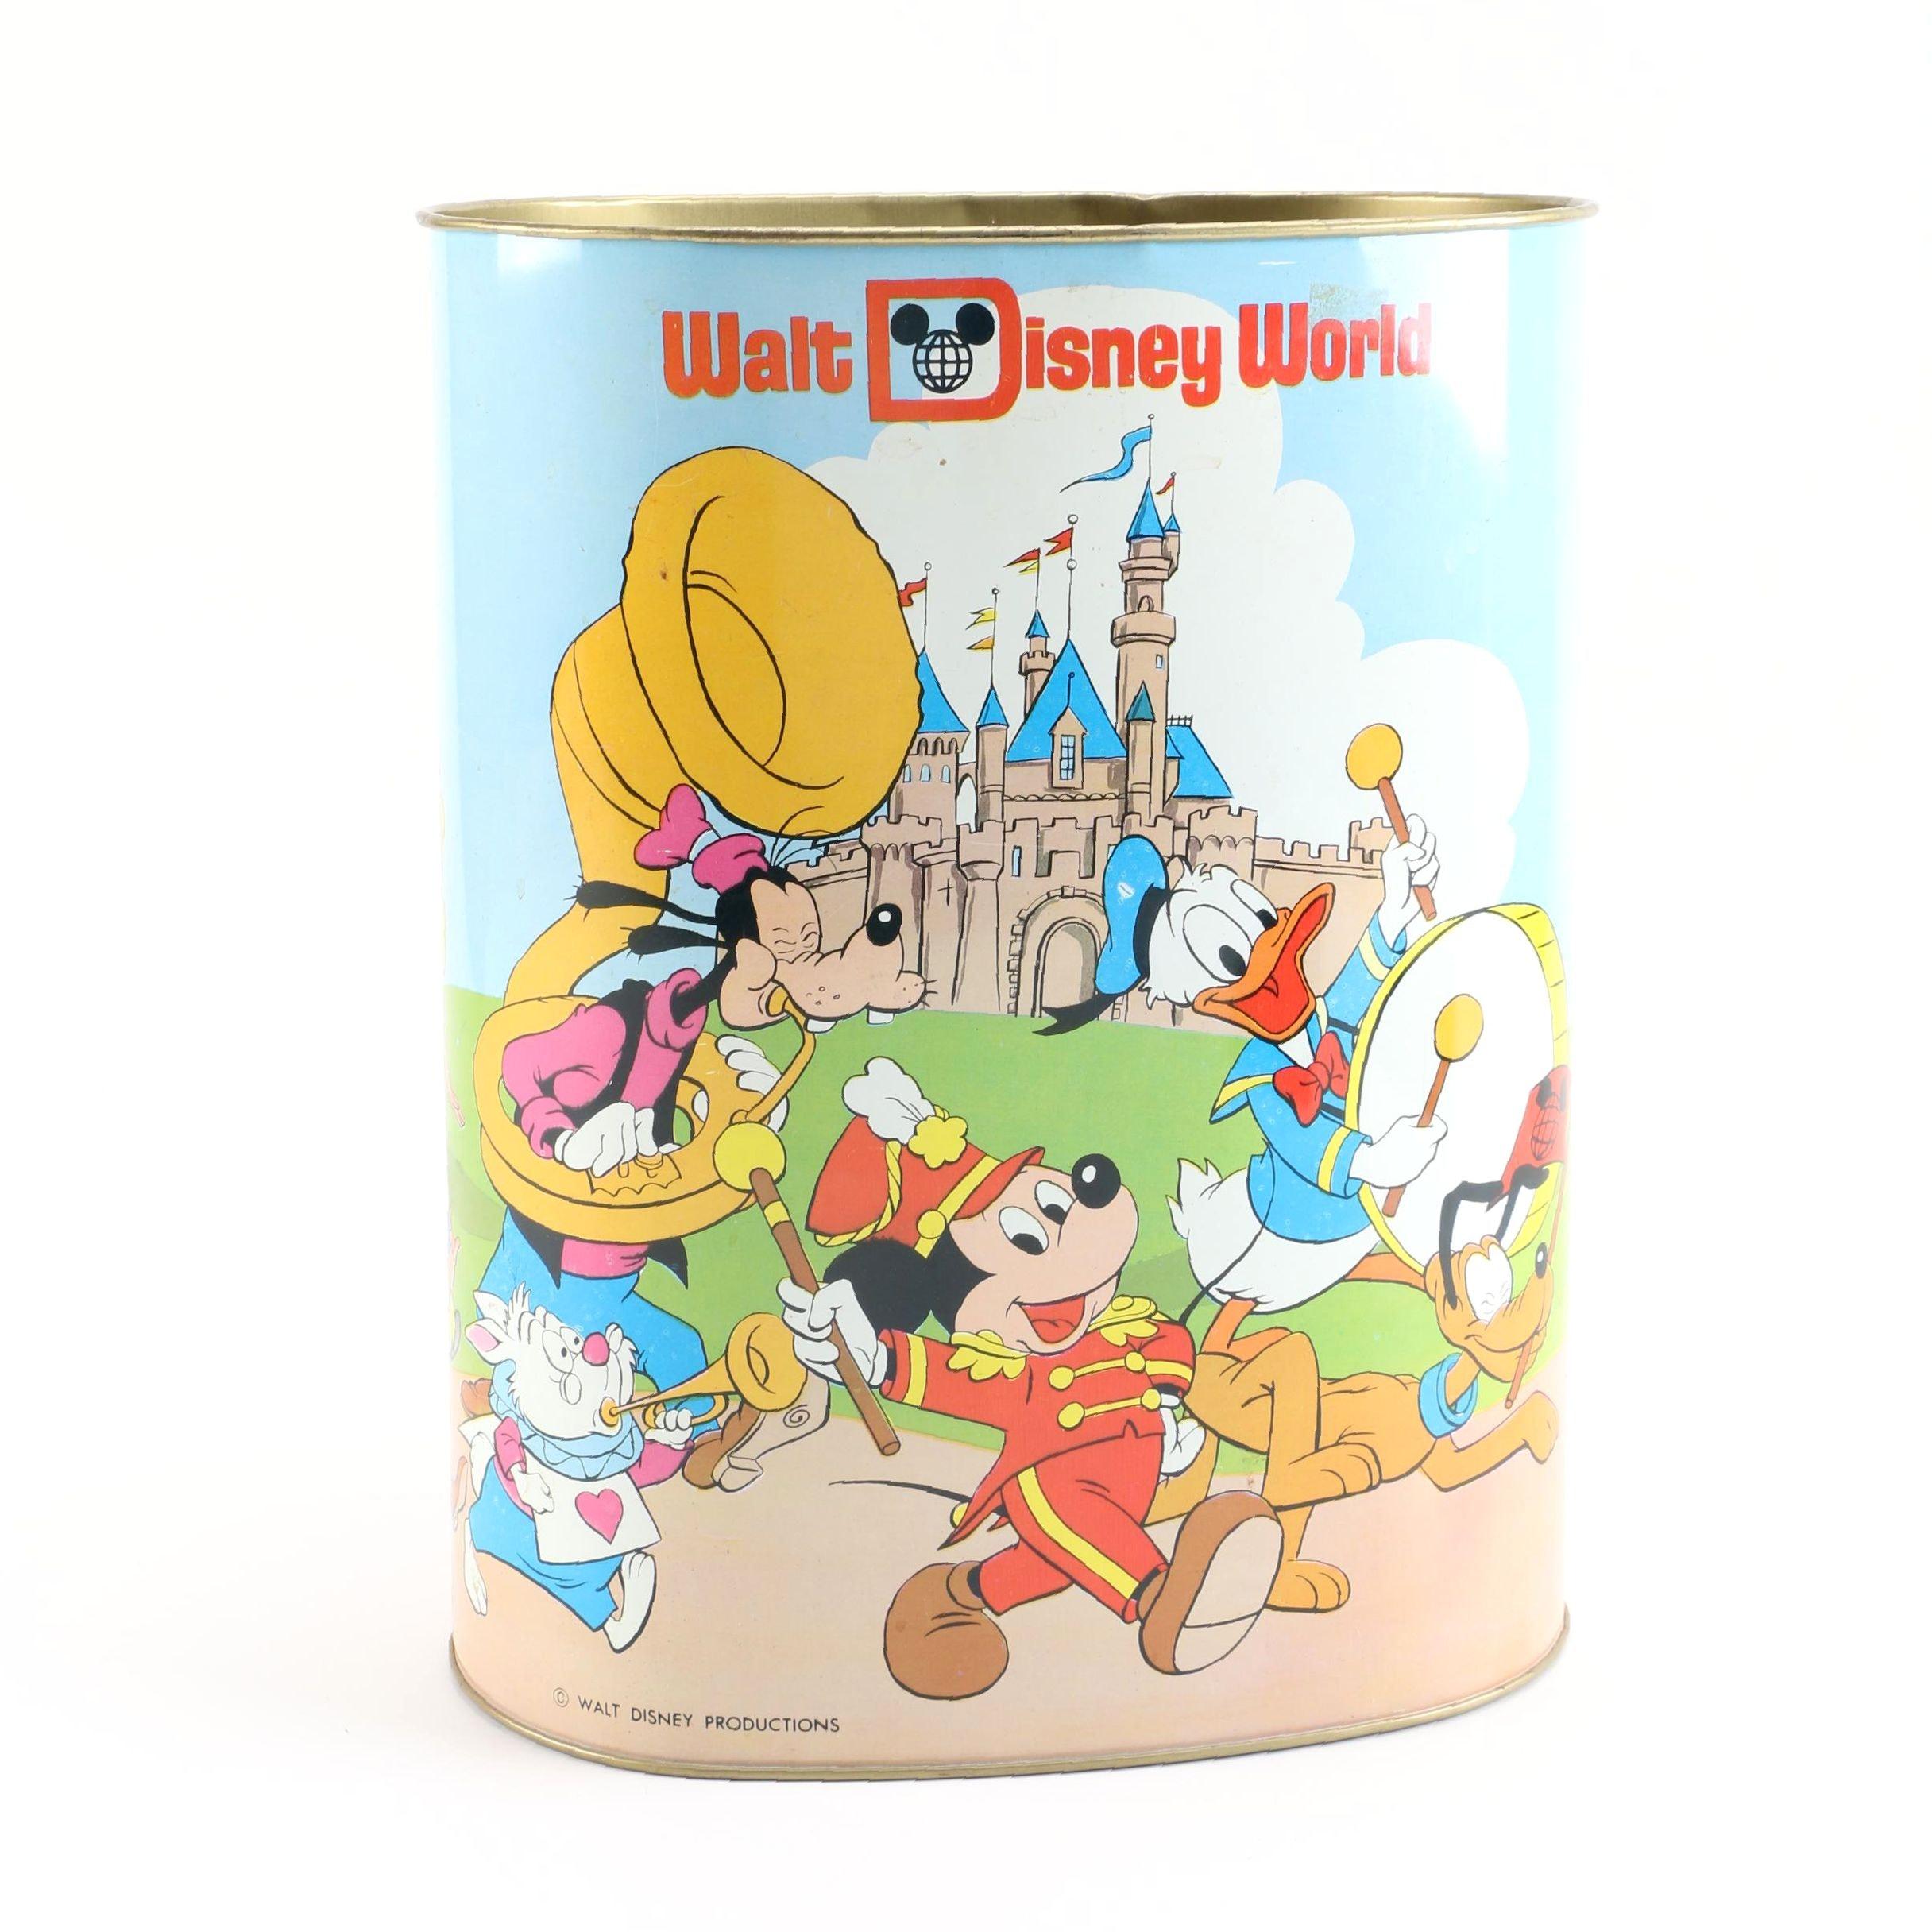 Vintage Disney Themed Wastepaper Basket by Cheinco